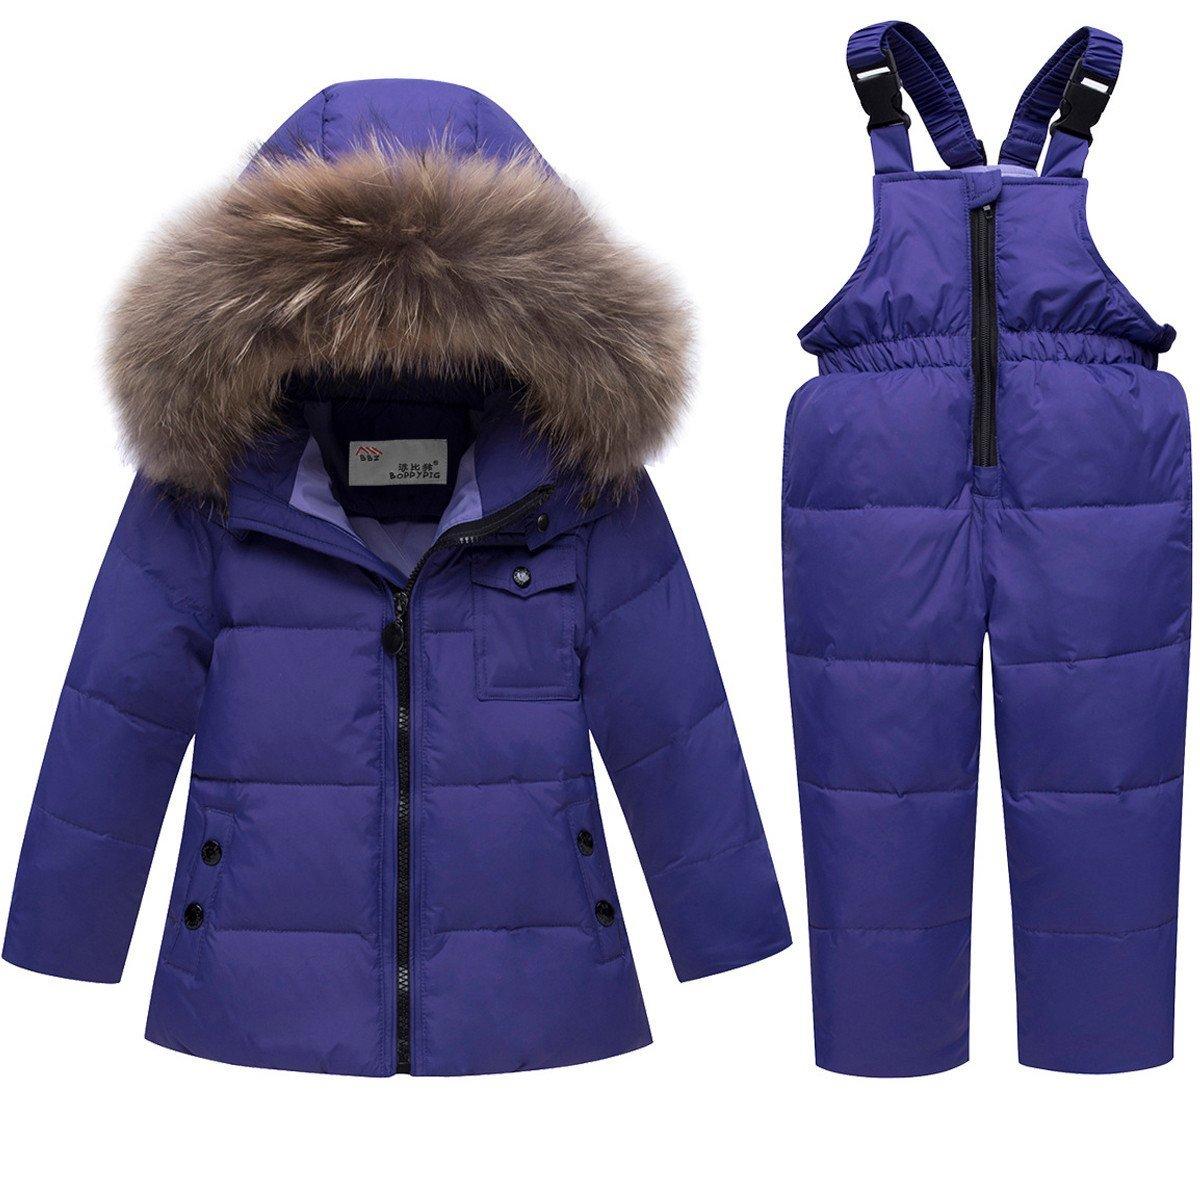 JELEUON Baby Girls and Boys Winter Warm Hooded Fur Trim Zipper Snowsuit Puffer Down Jacket with Snow Ski Bib Pants 4-5 Years by JELEUON